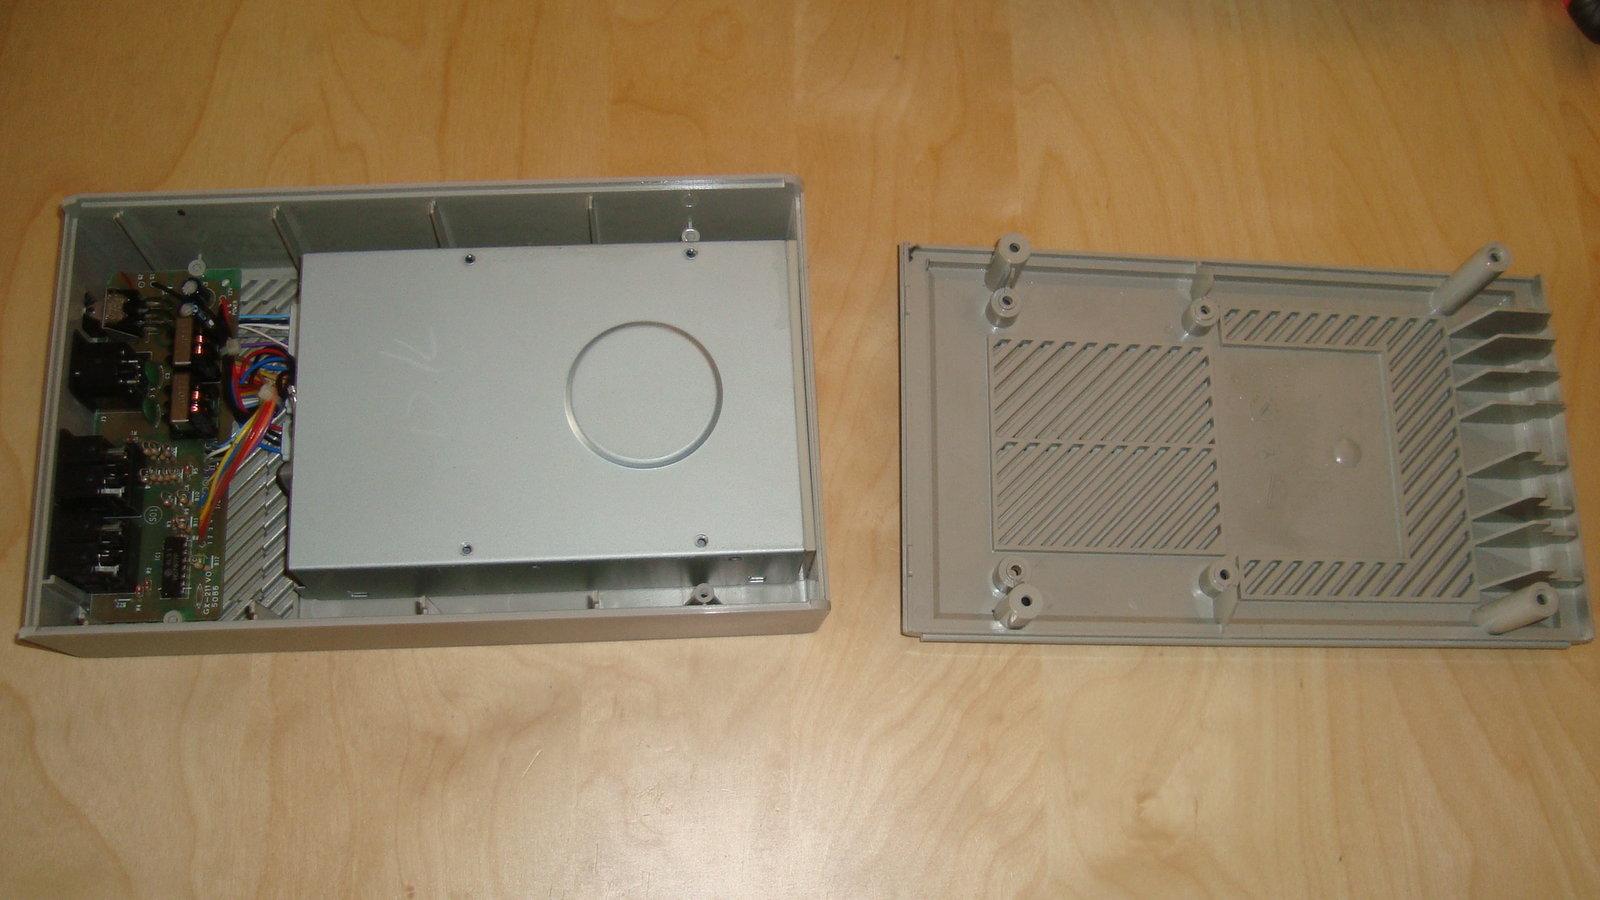 [TEST] Lecteurs disquettes externes SF354/SF314 - Atari ST 201015110447740036